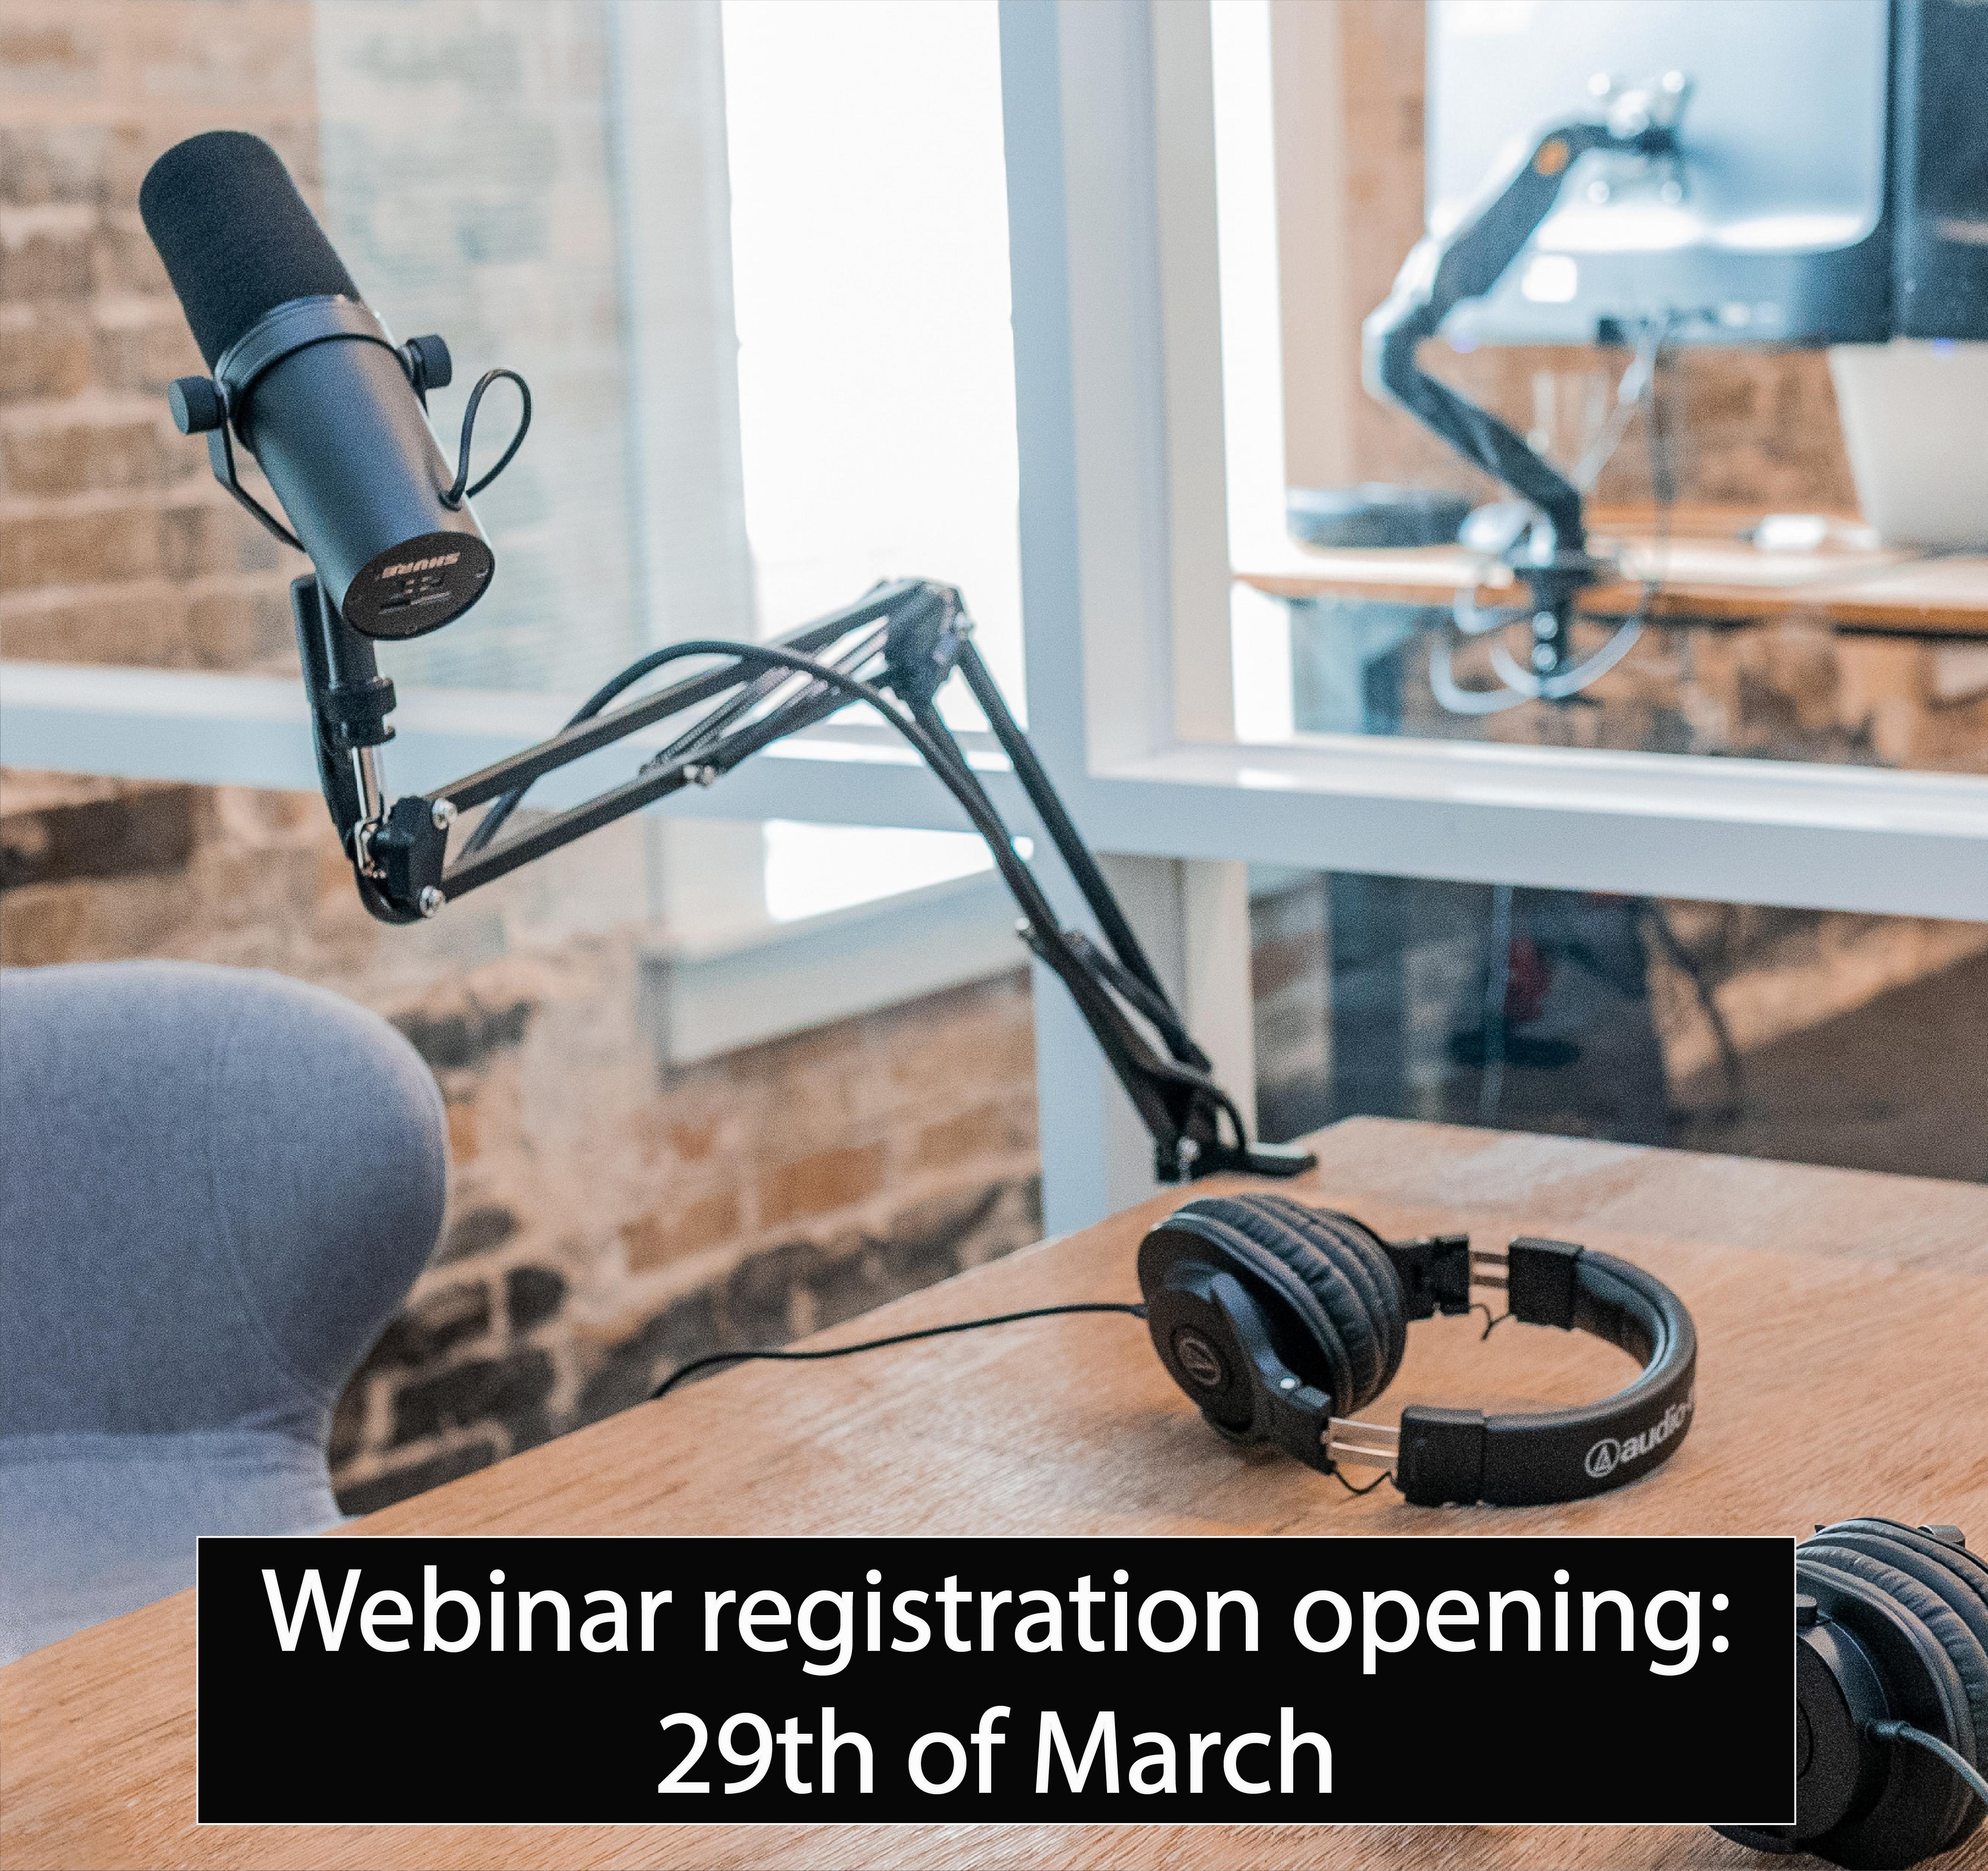 Webinar 1 - Registration opening